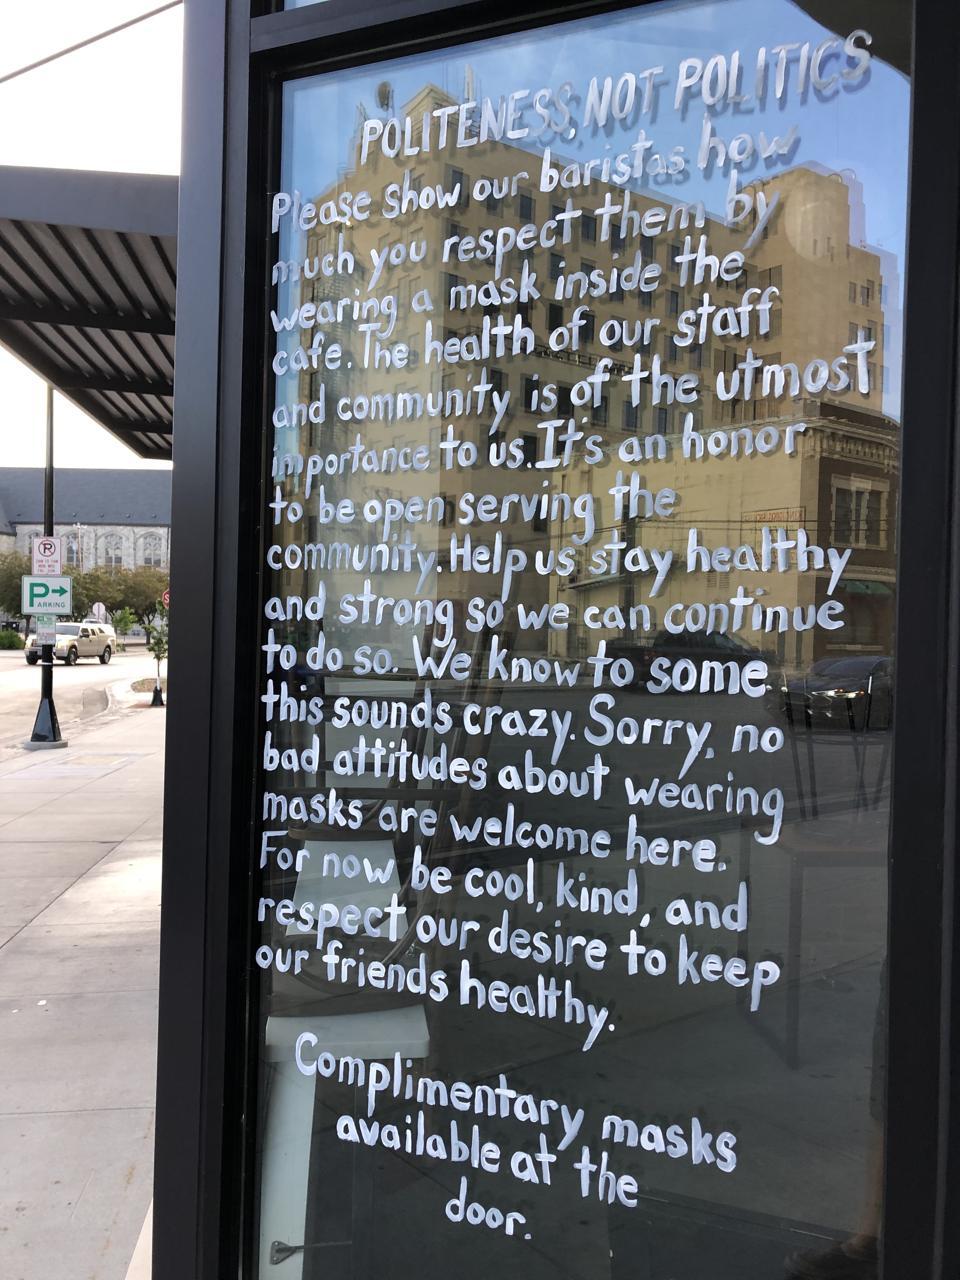 ″Politeness, not politics″ is the message at a Fargo, North Dakota coffee shop.